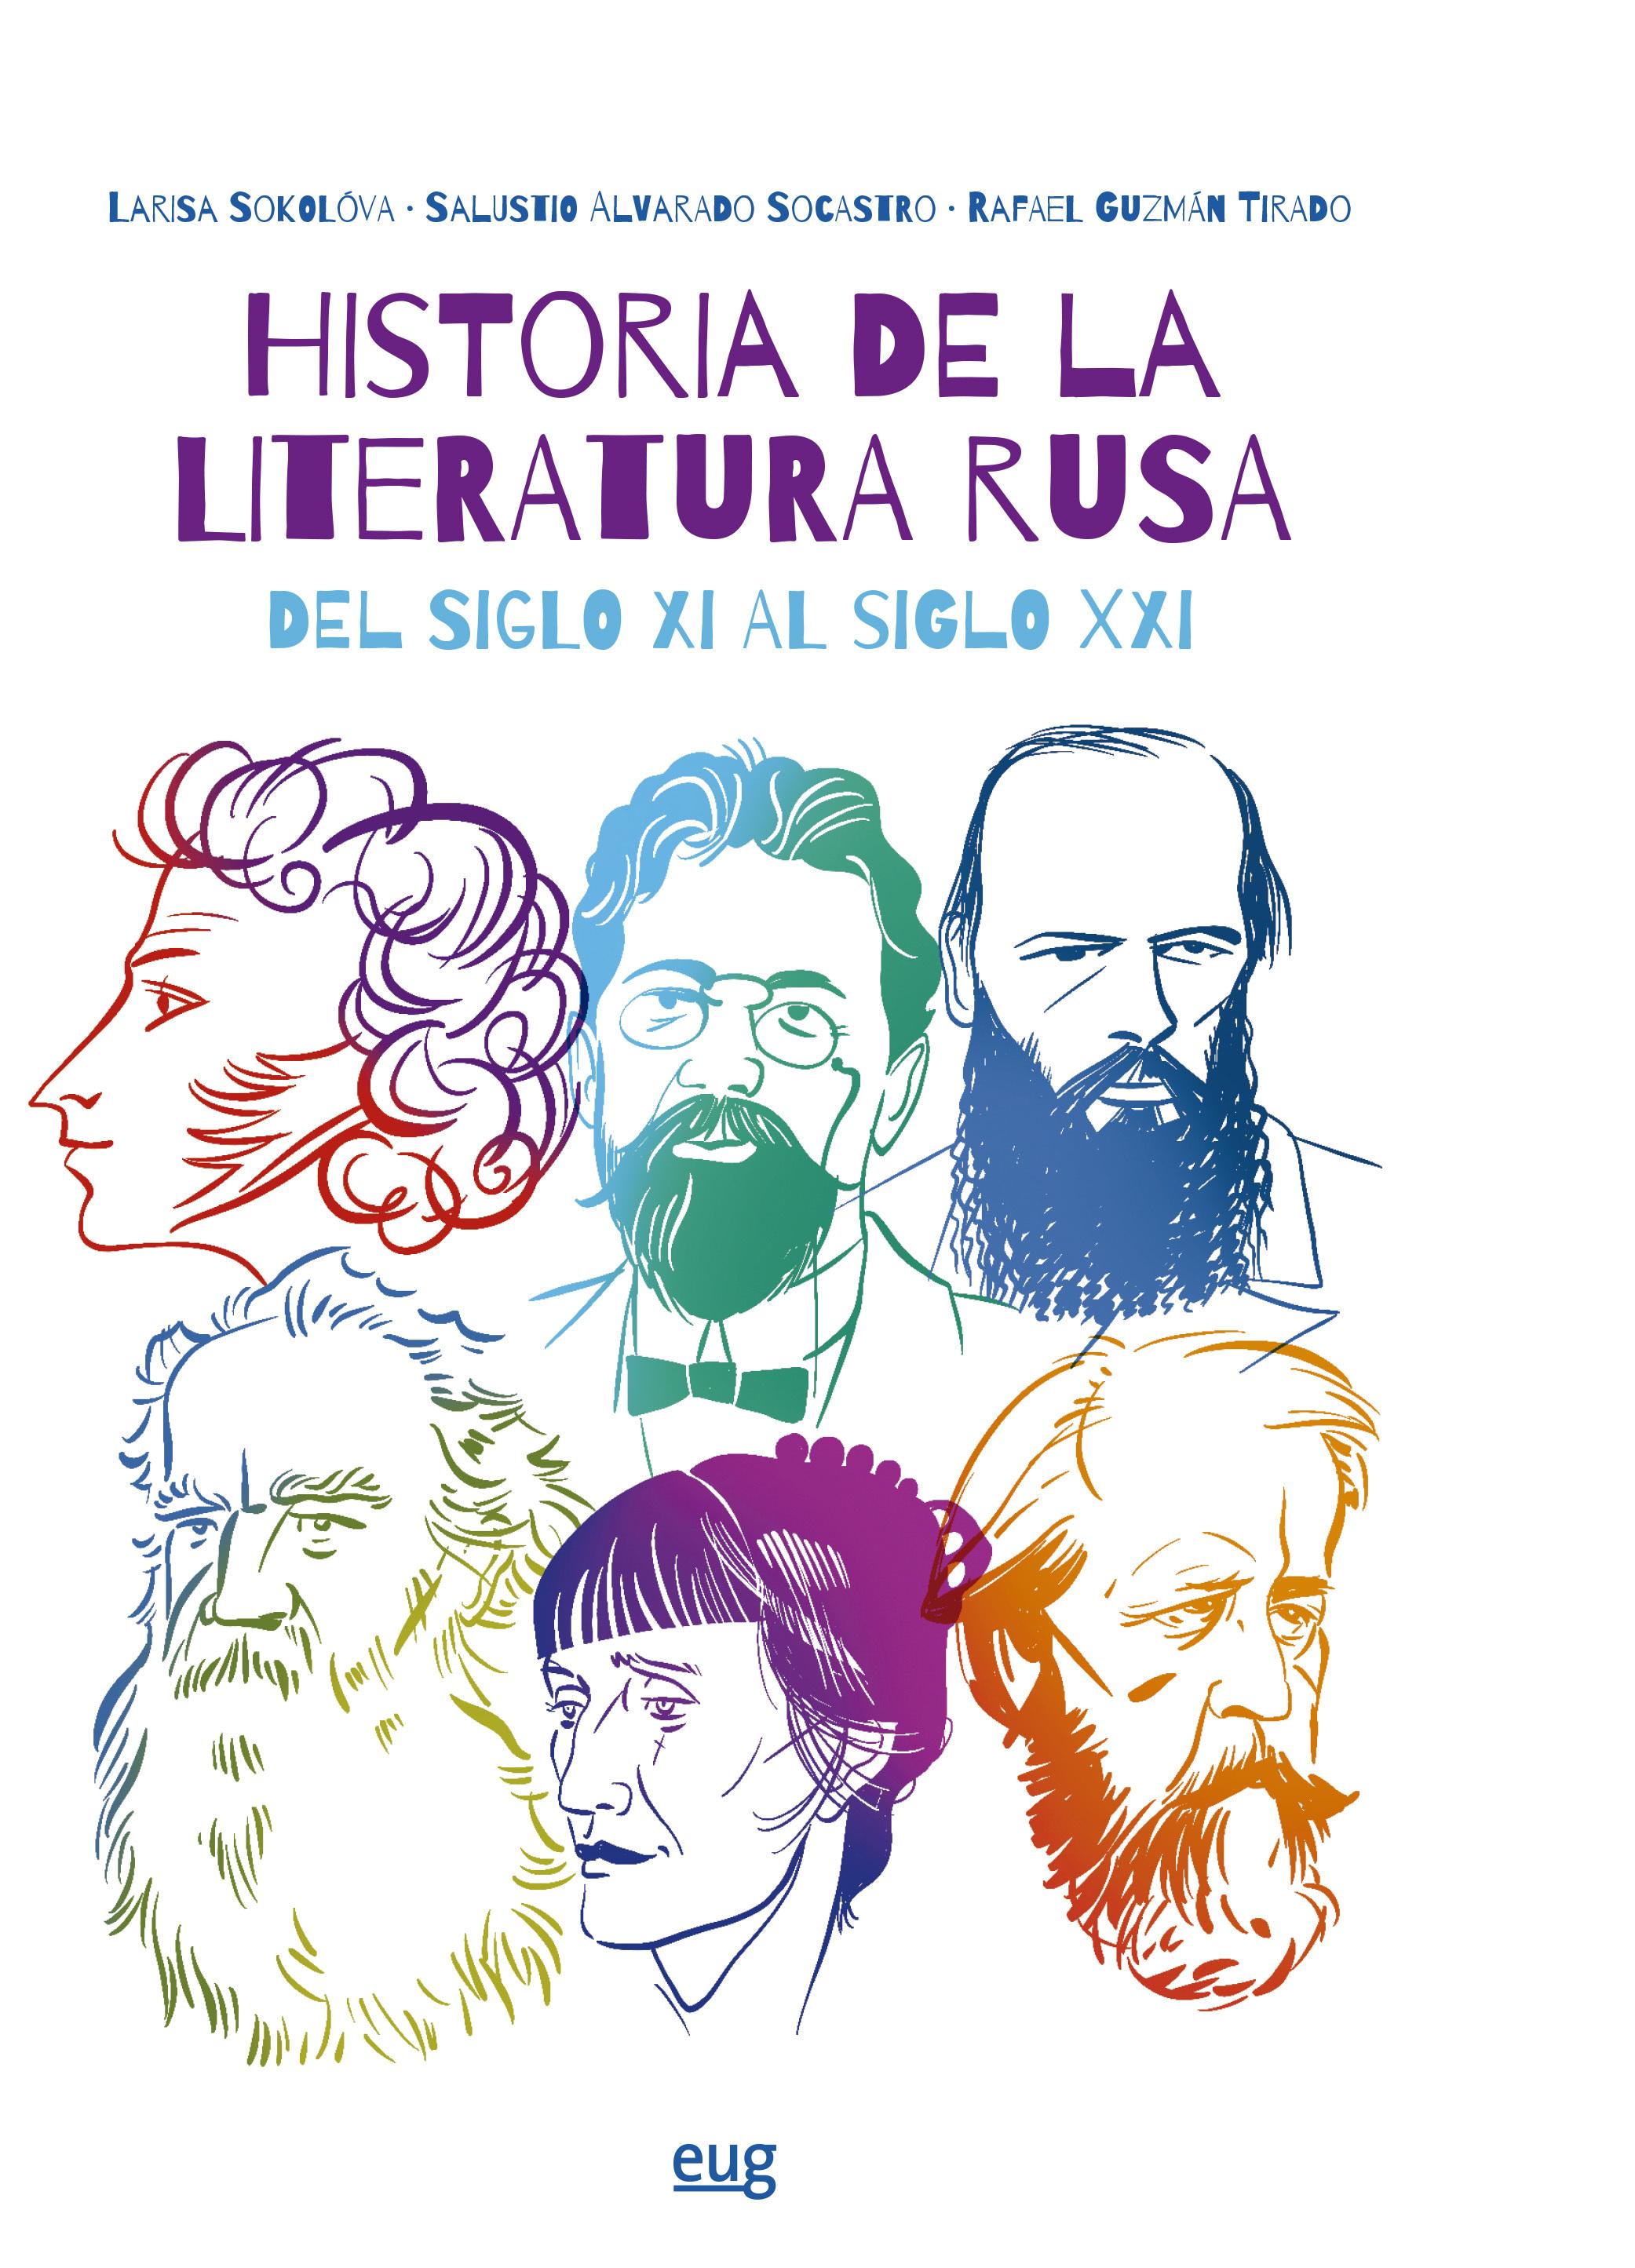 'Historia de la literatura rusa del siglo XI al XXI', libro del mes de marzo de la Editorial Universidad de Granada